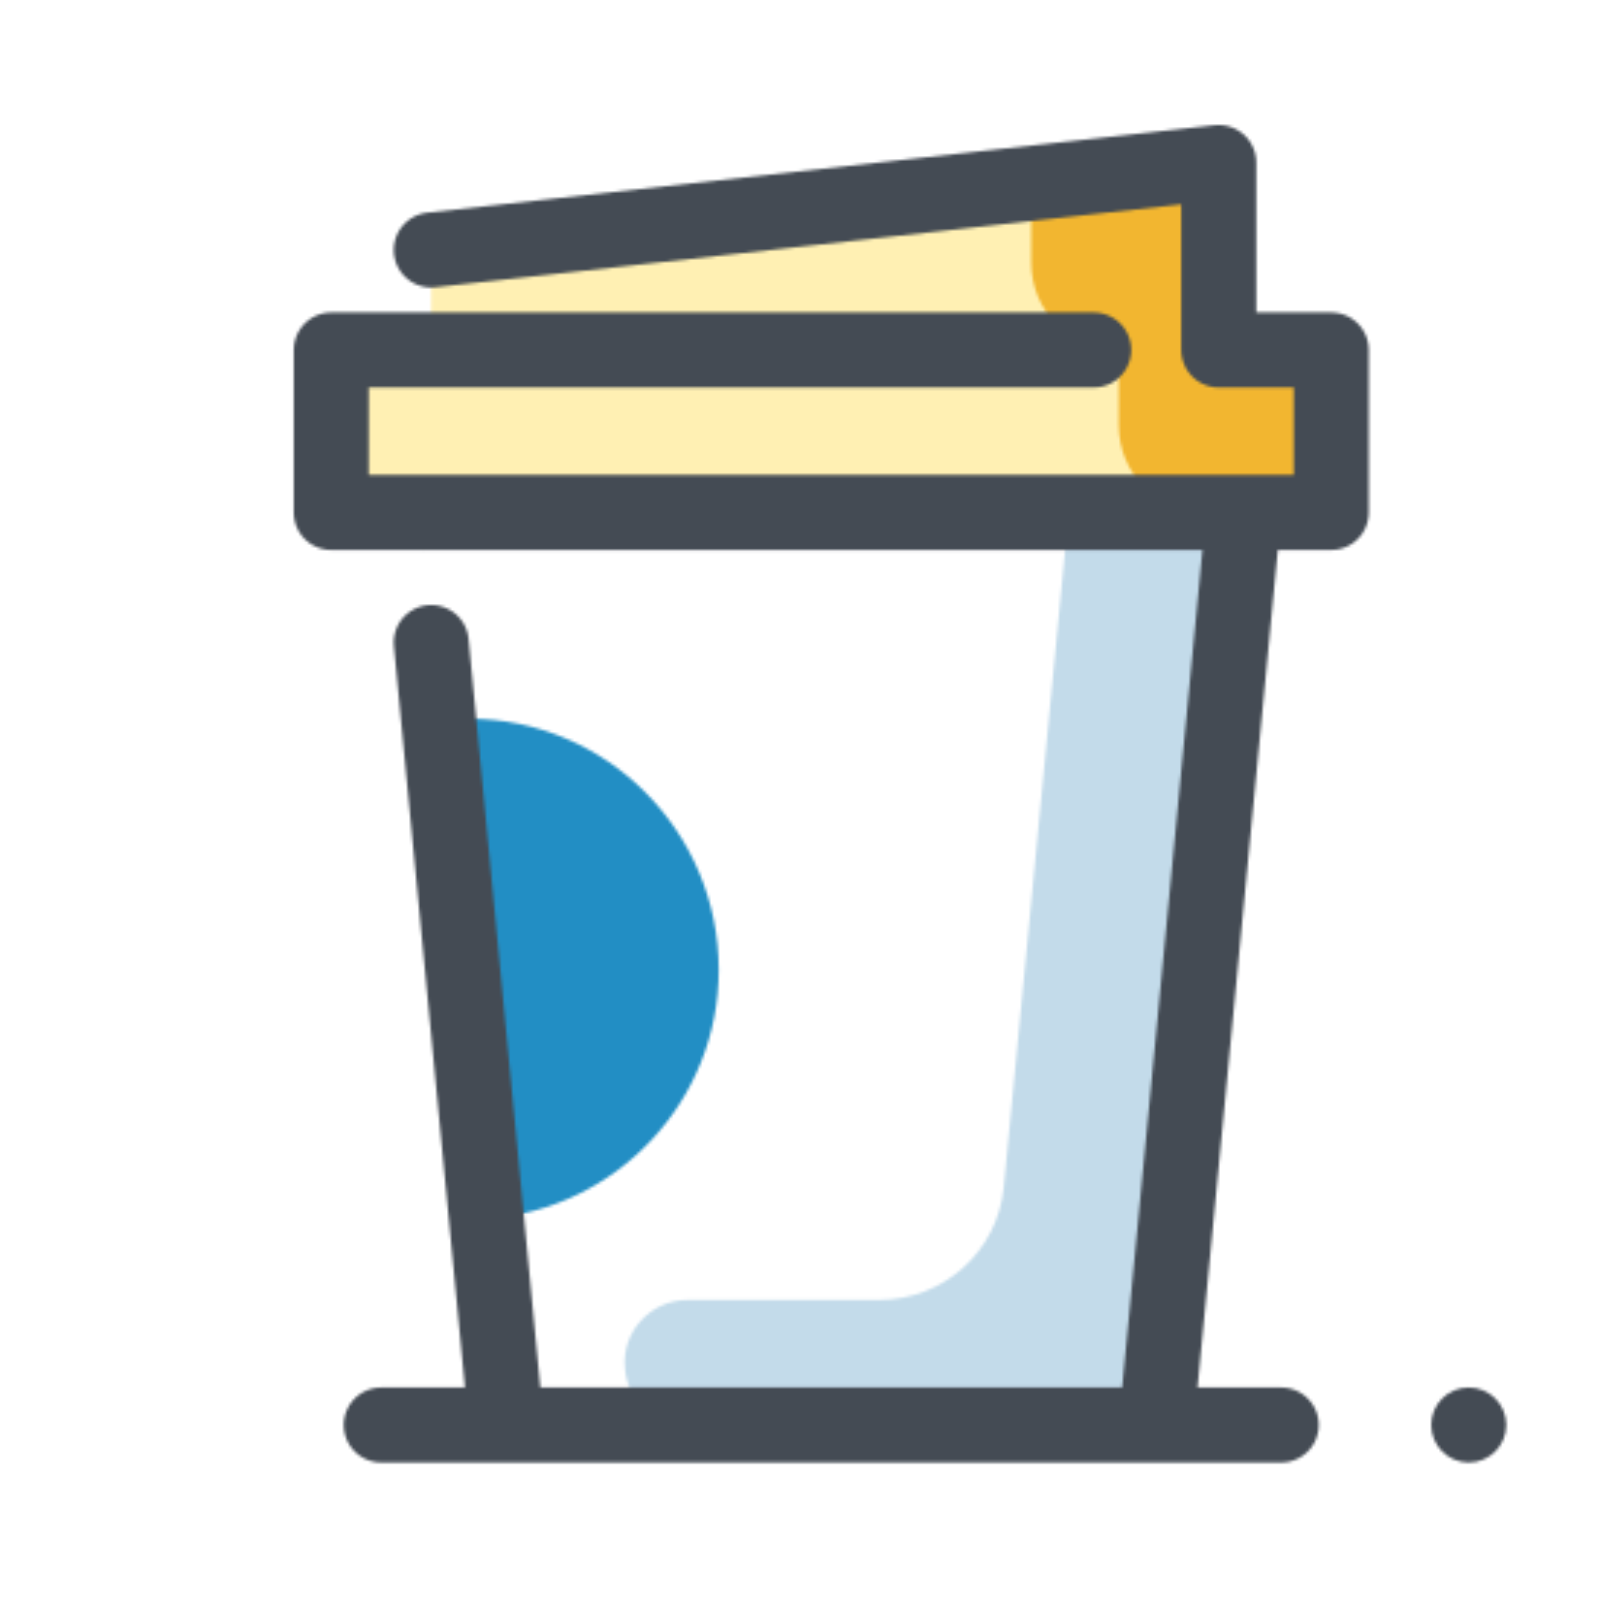 Takeaway Hot Drink icon